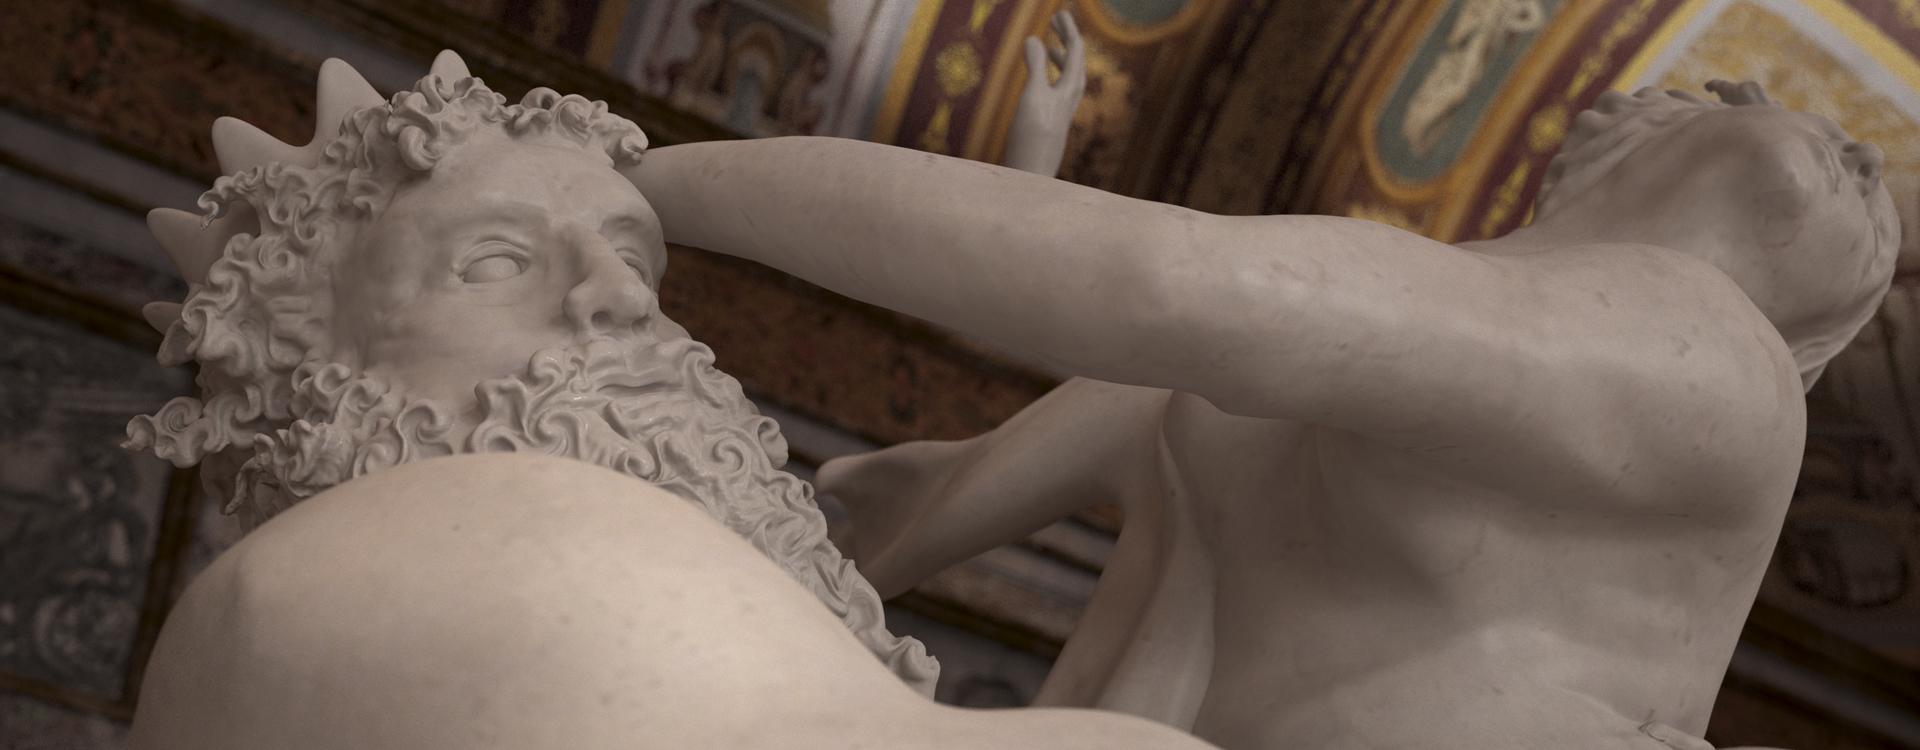 Galleria Borghese-08_1.jpg